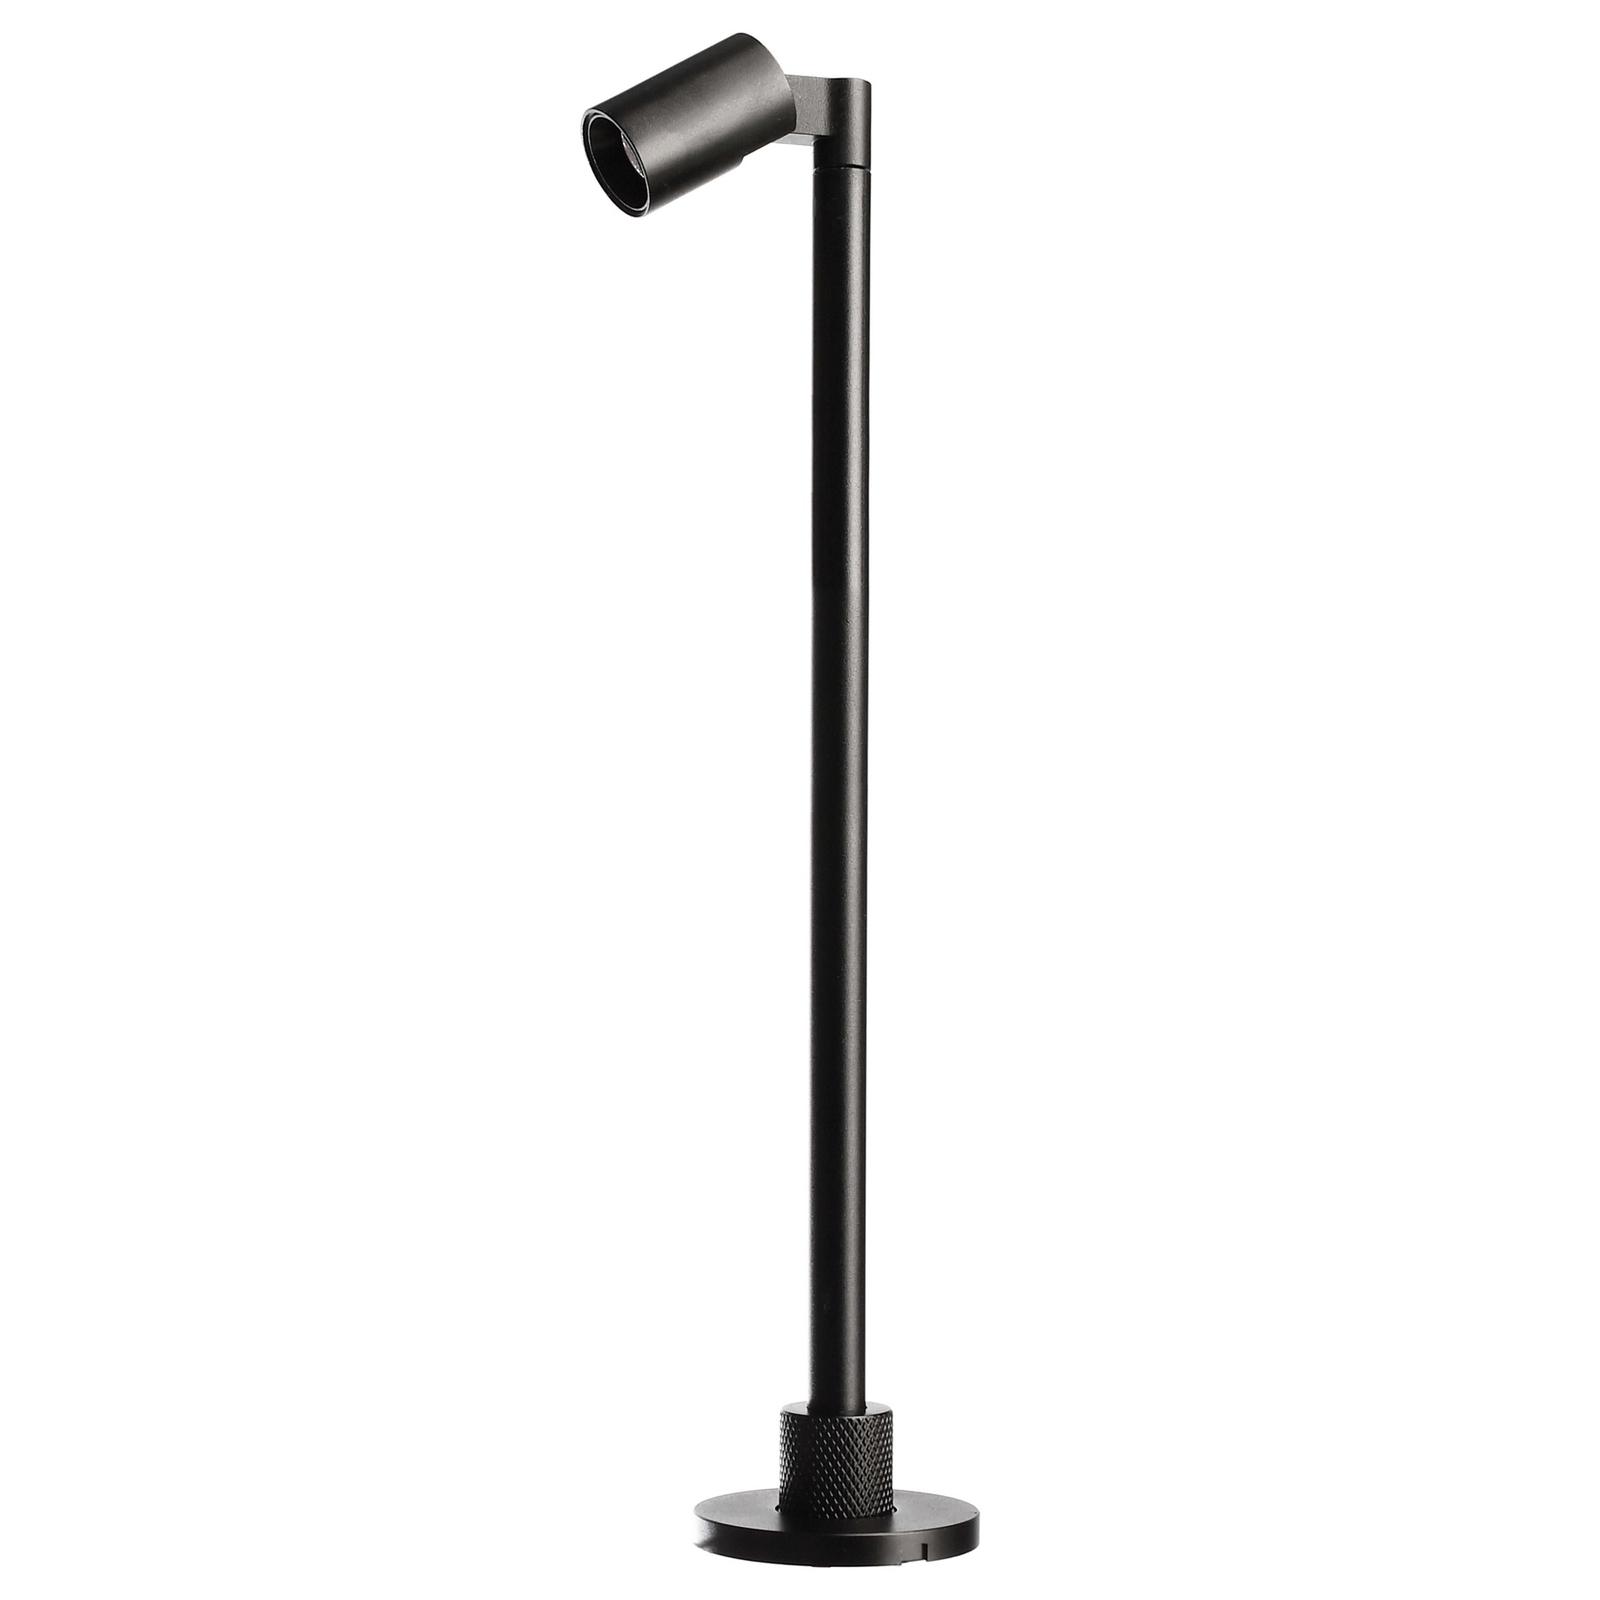 LED-Displayleuchte Herculis big 4.000K, schwarz